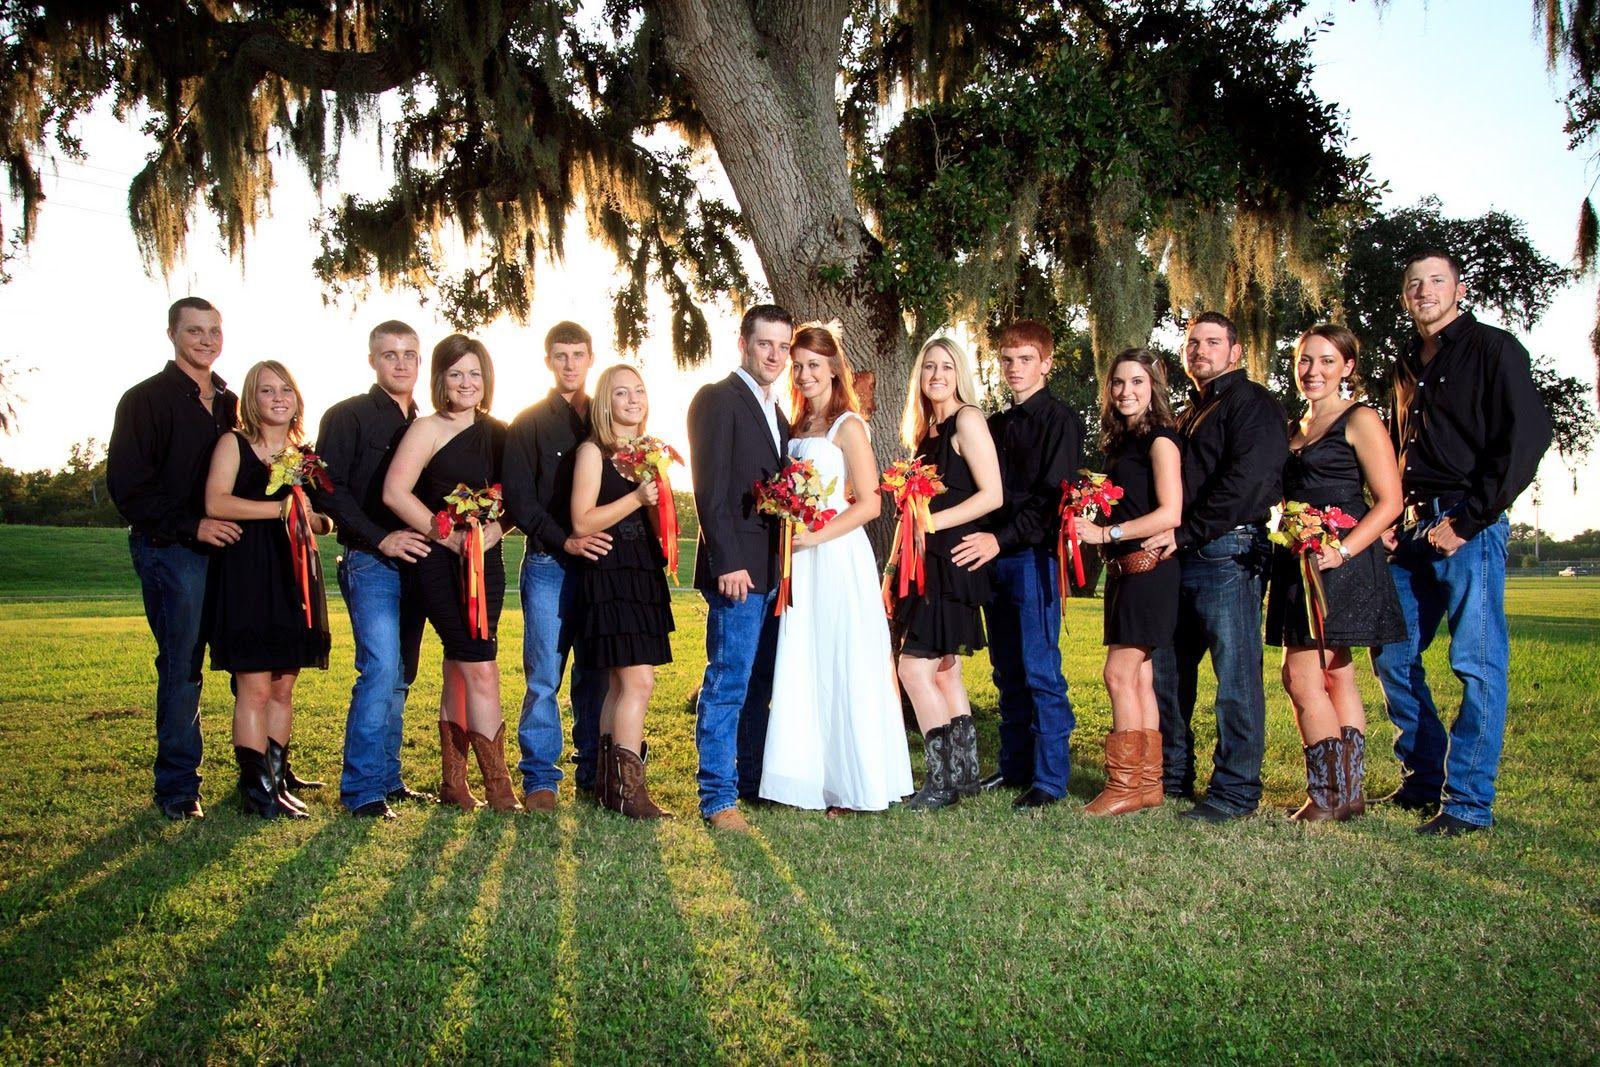 9 Times Bridesmaids Brought It Wearing Black Dresses Black Bridesmaids Wedding Bridesmaid Dresses Black Bridesmaid Dresses [ 1162 x 930 Pixel ]